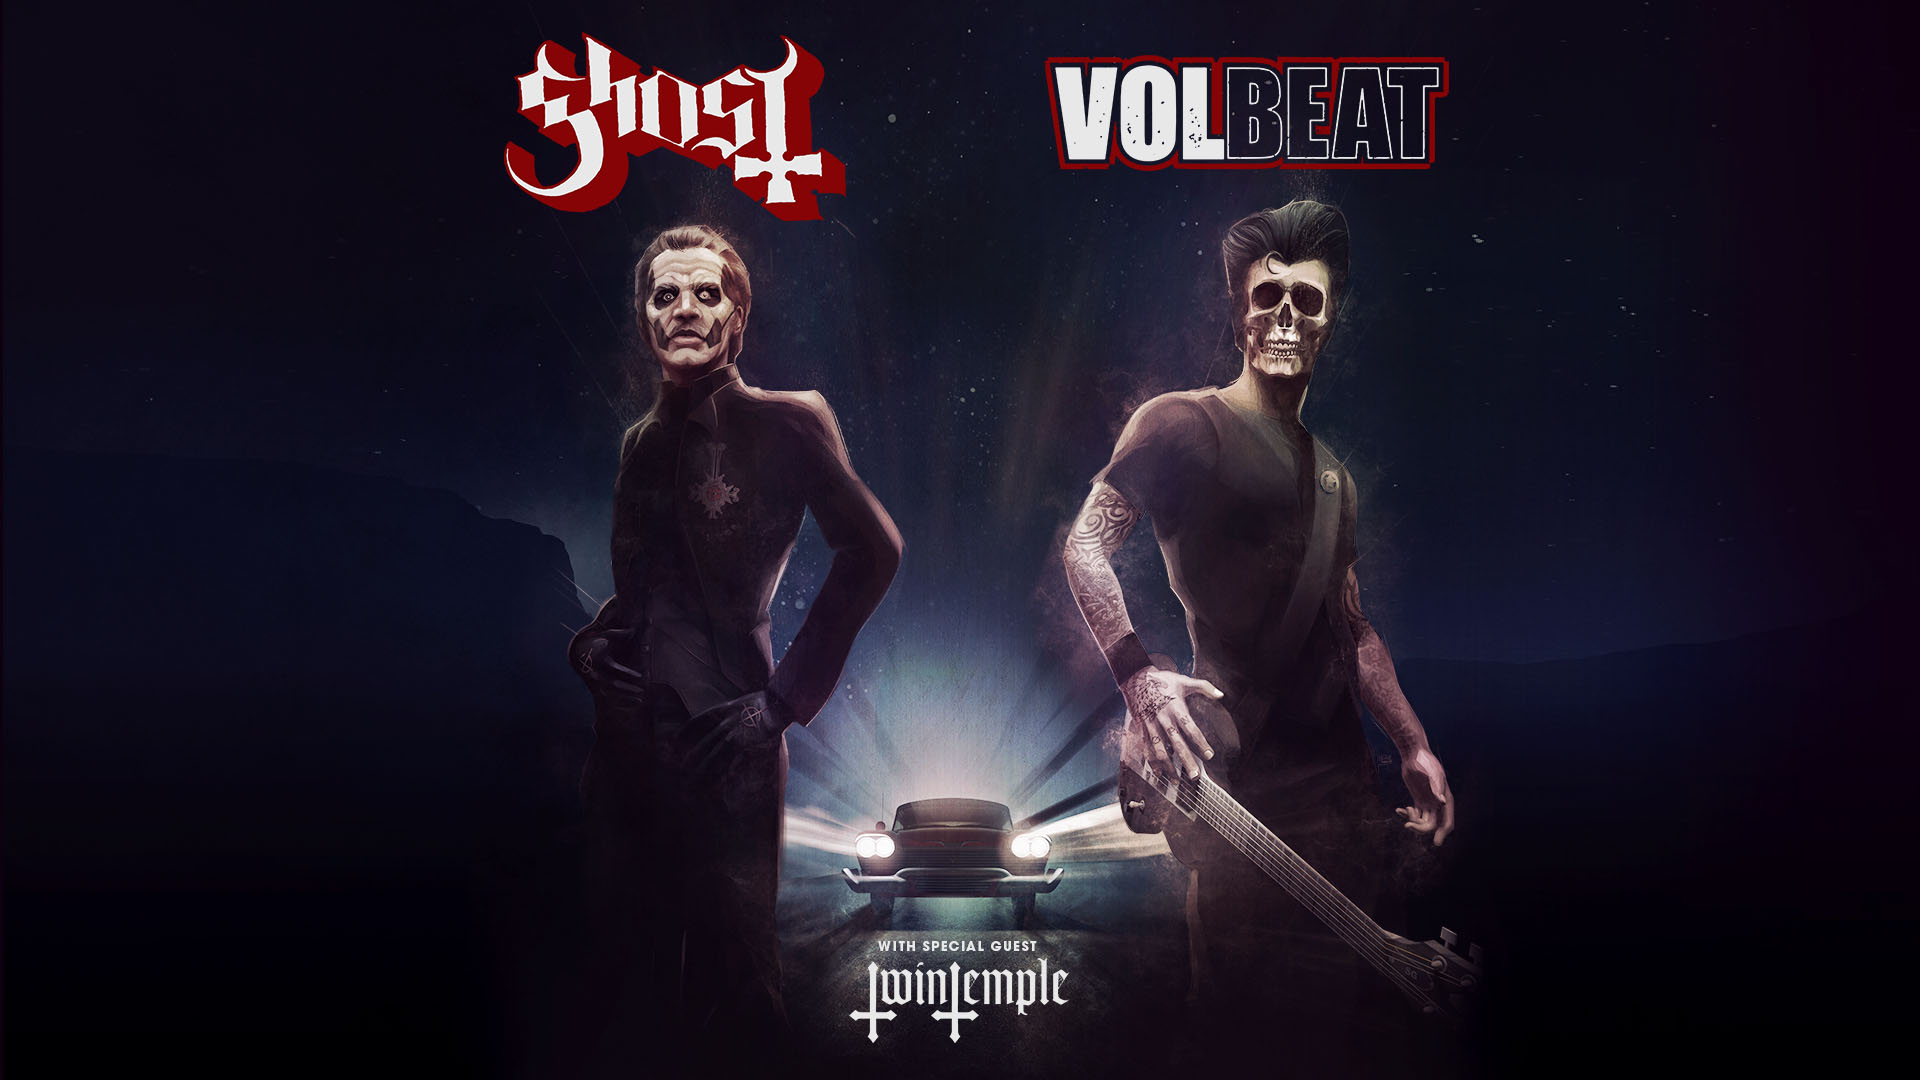 February 19 – Ghost & Volbeat